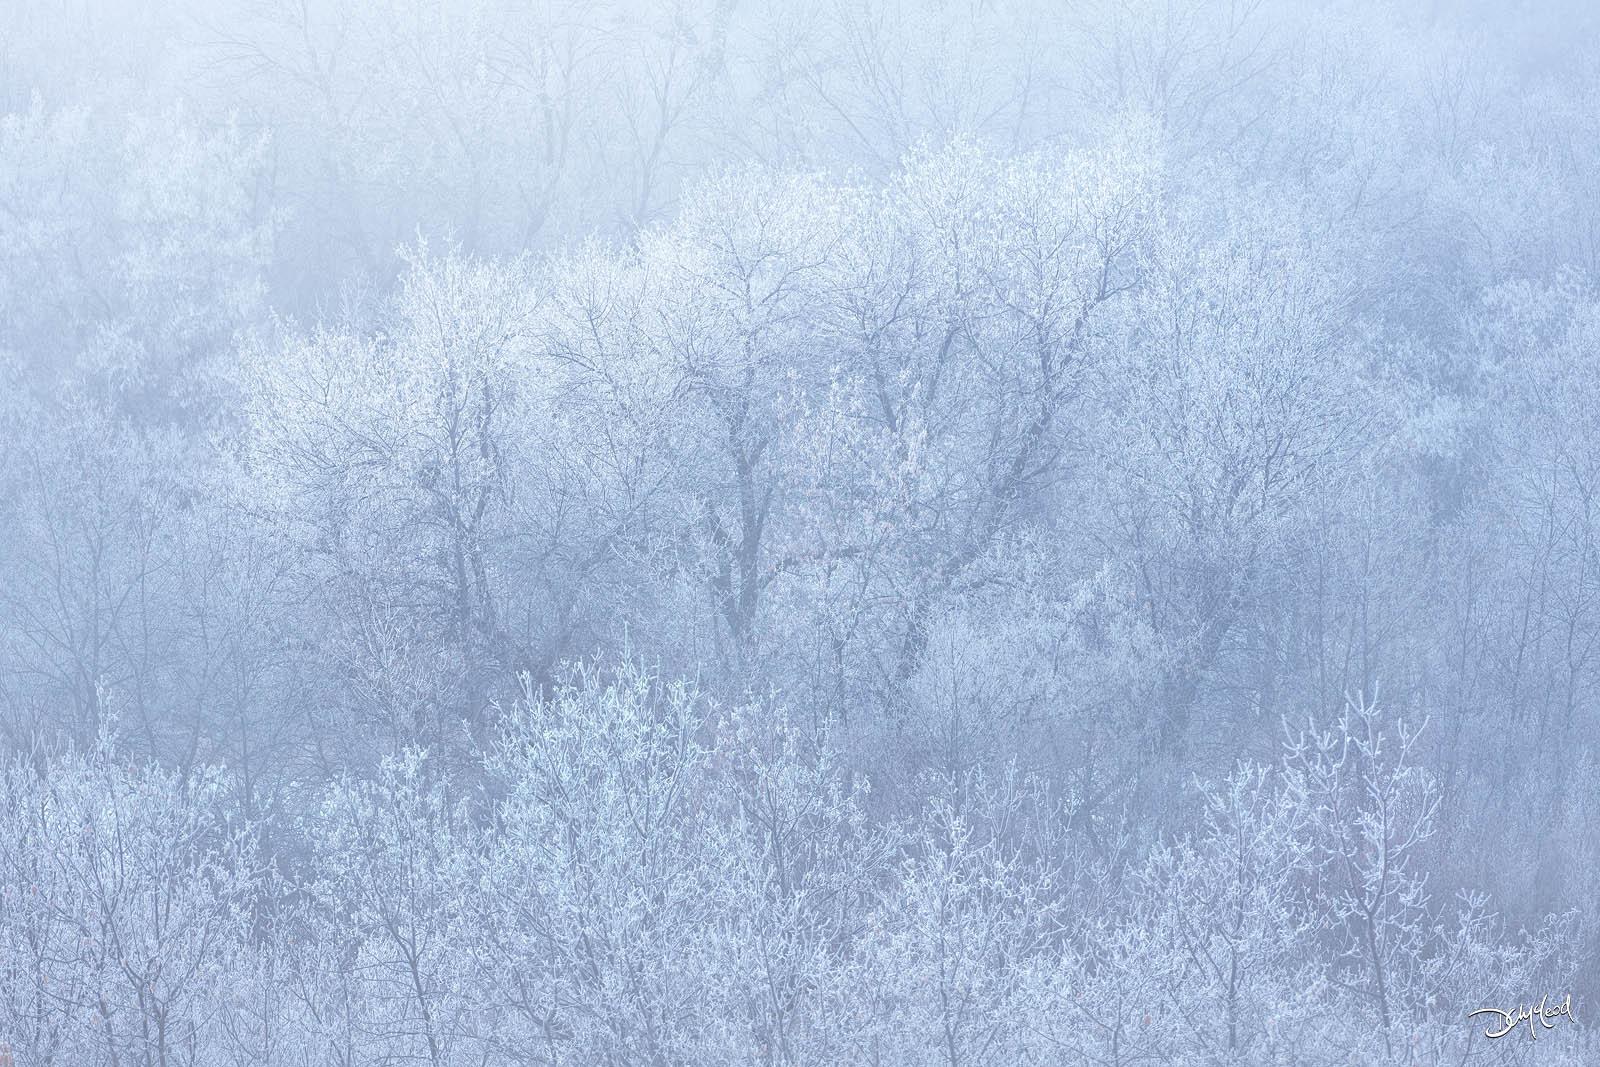 frozen, saskatchewan, rare, fog, hoar frost, forest, trees, photo